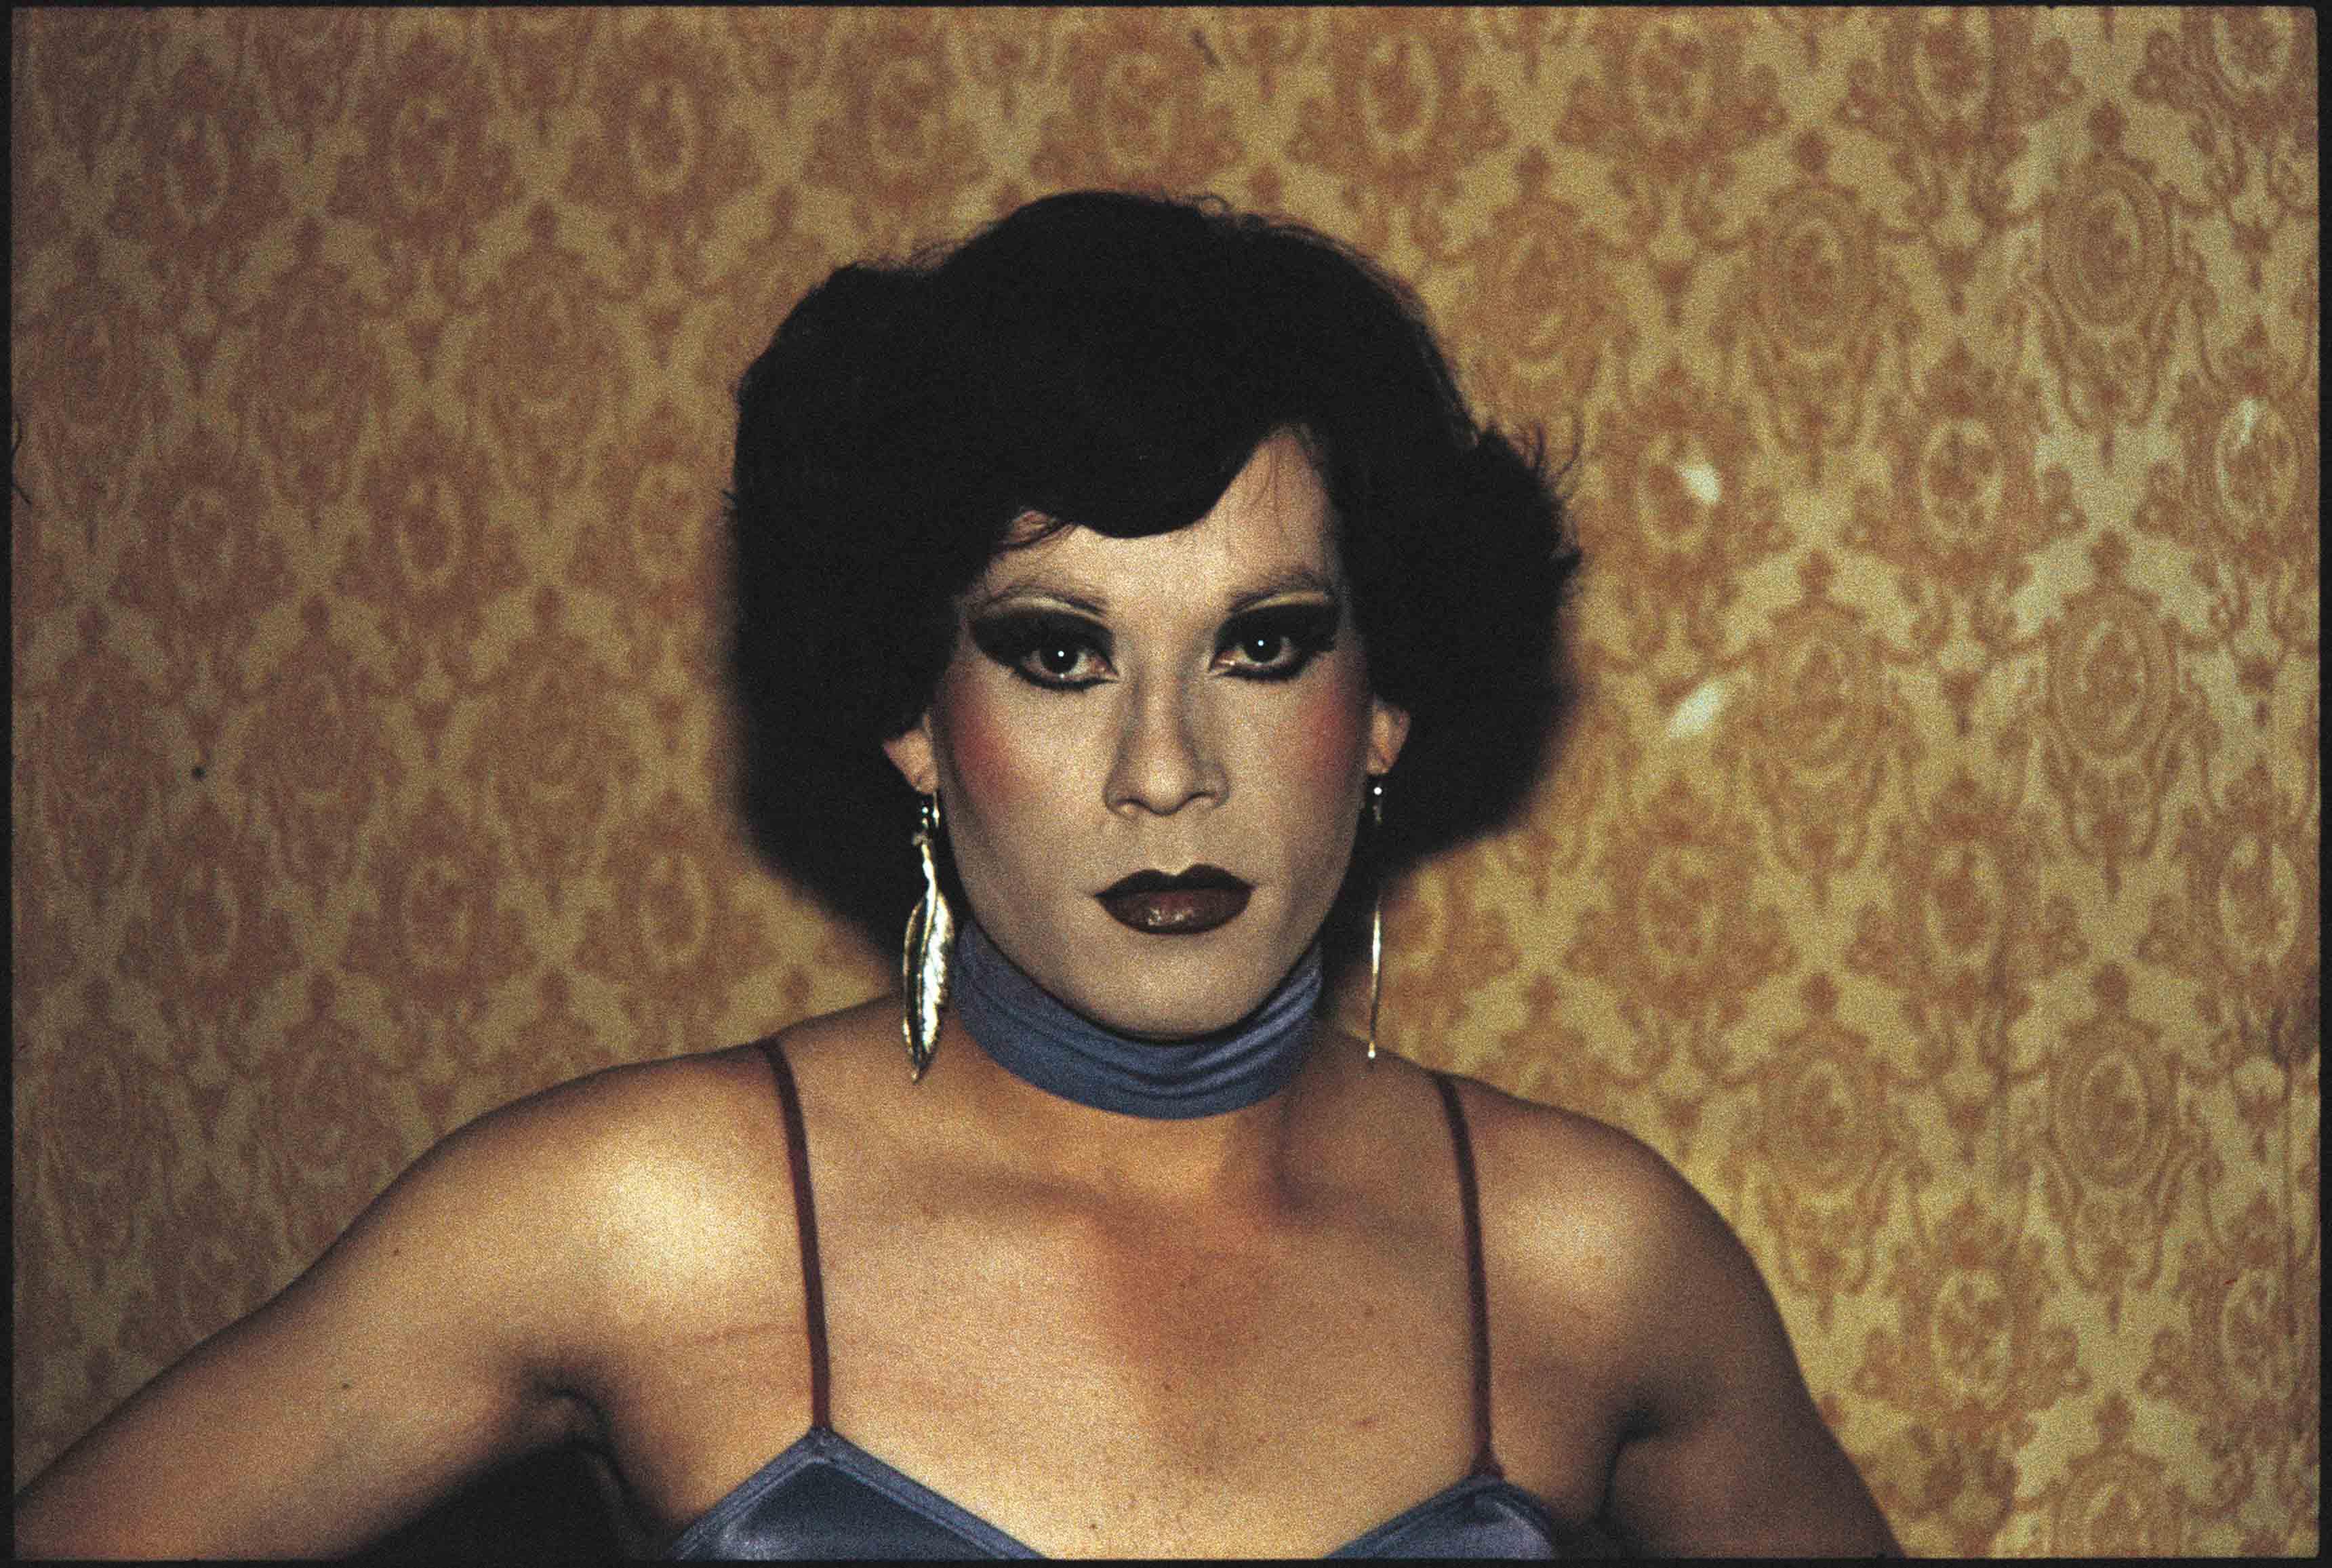 Paz Errázuriz_From the series La Manzana de Adán (Adam's Apple), 1983